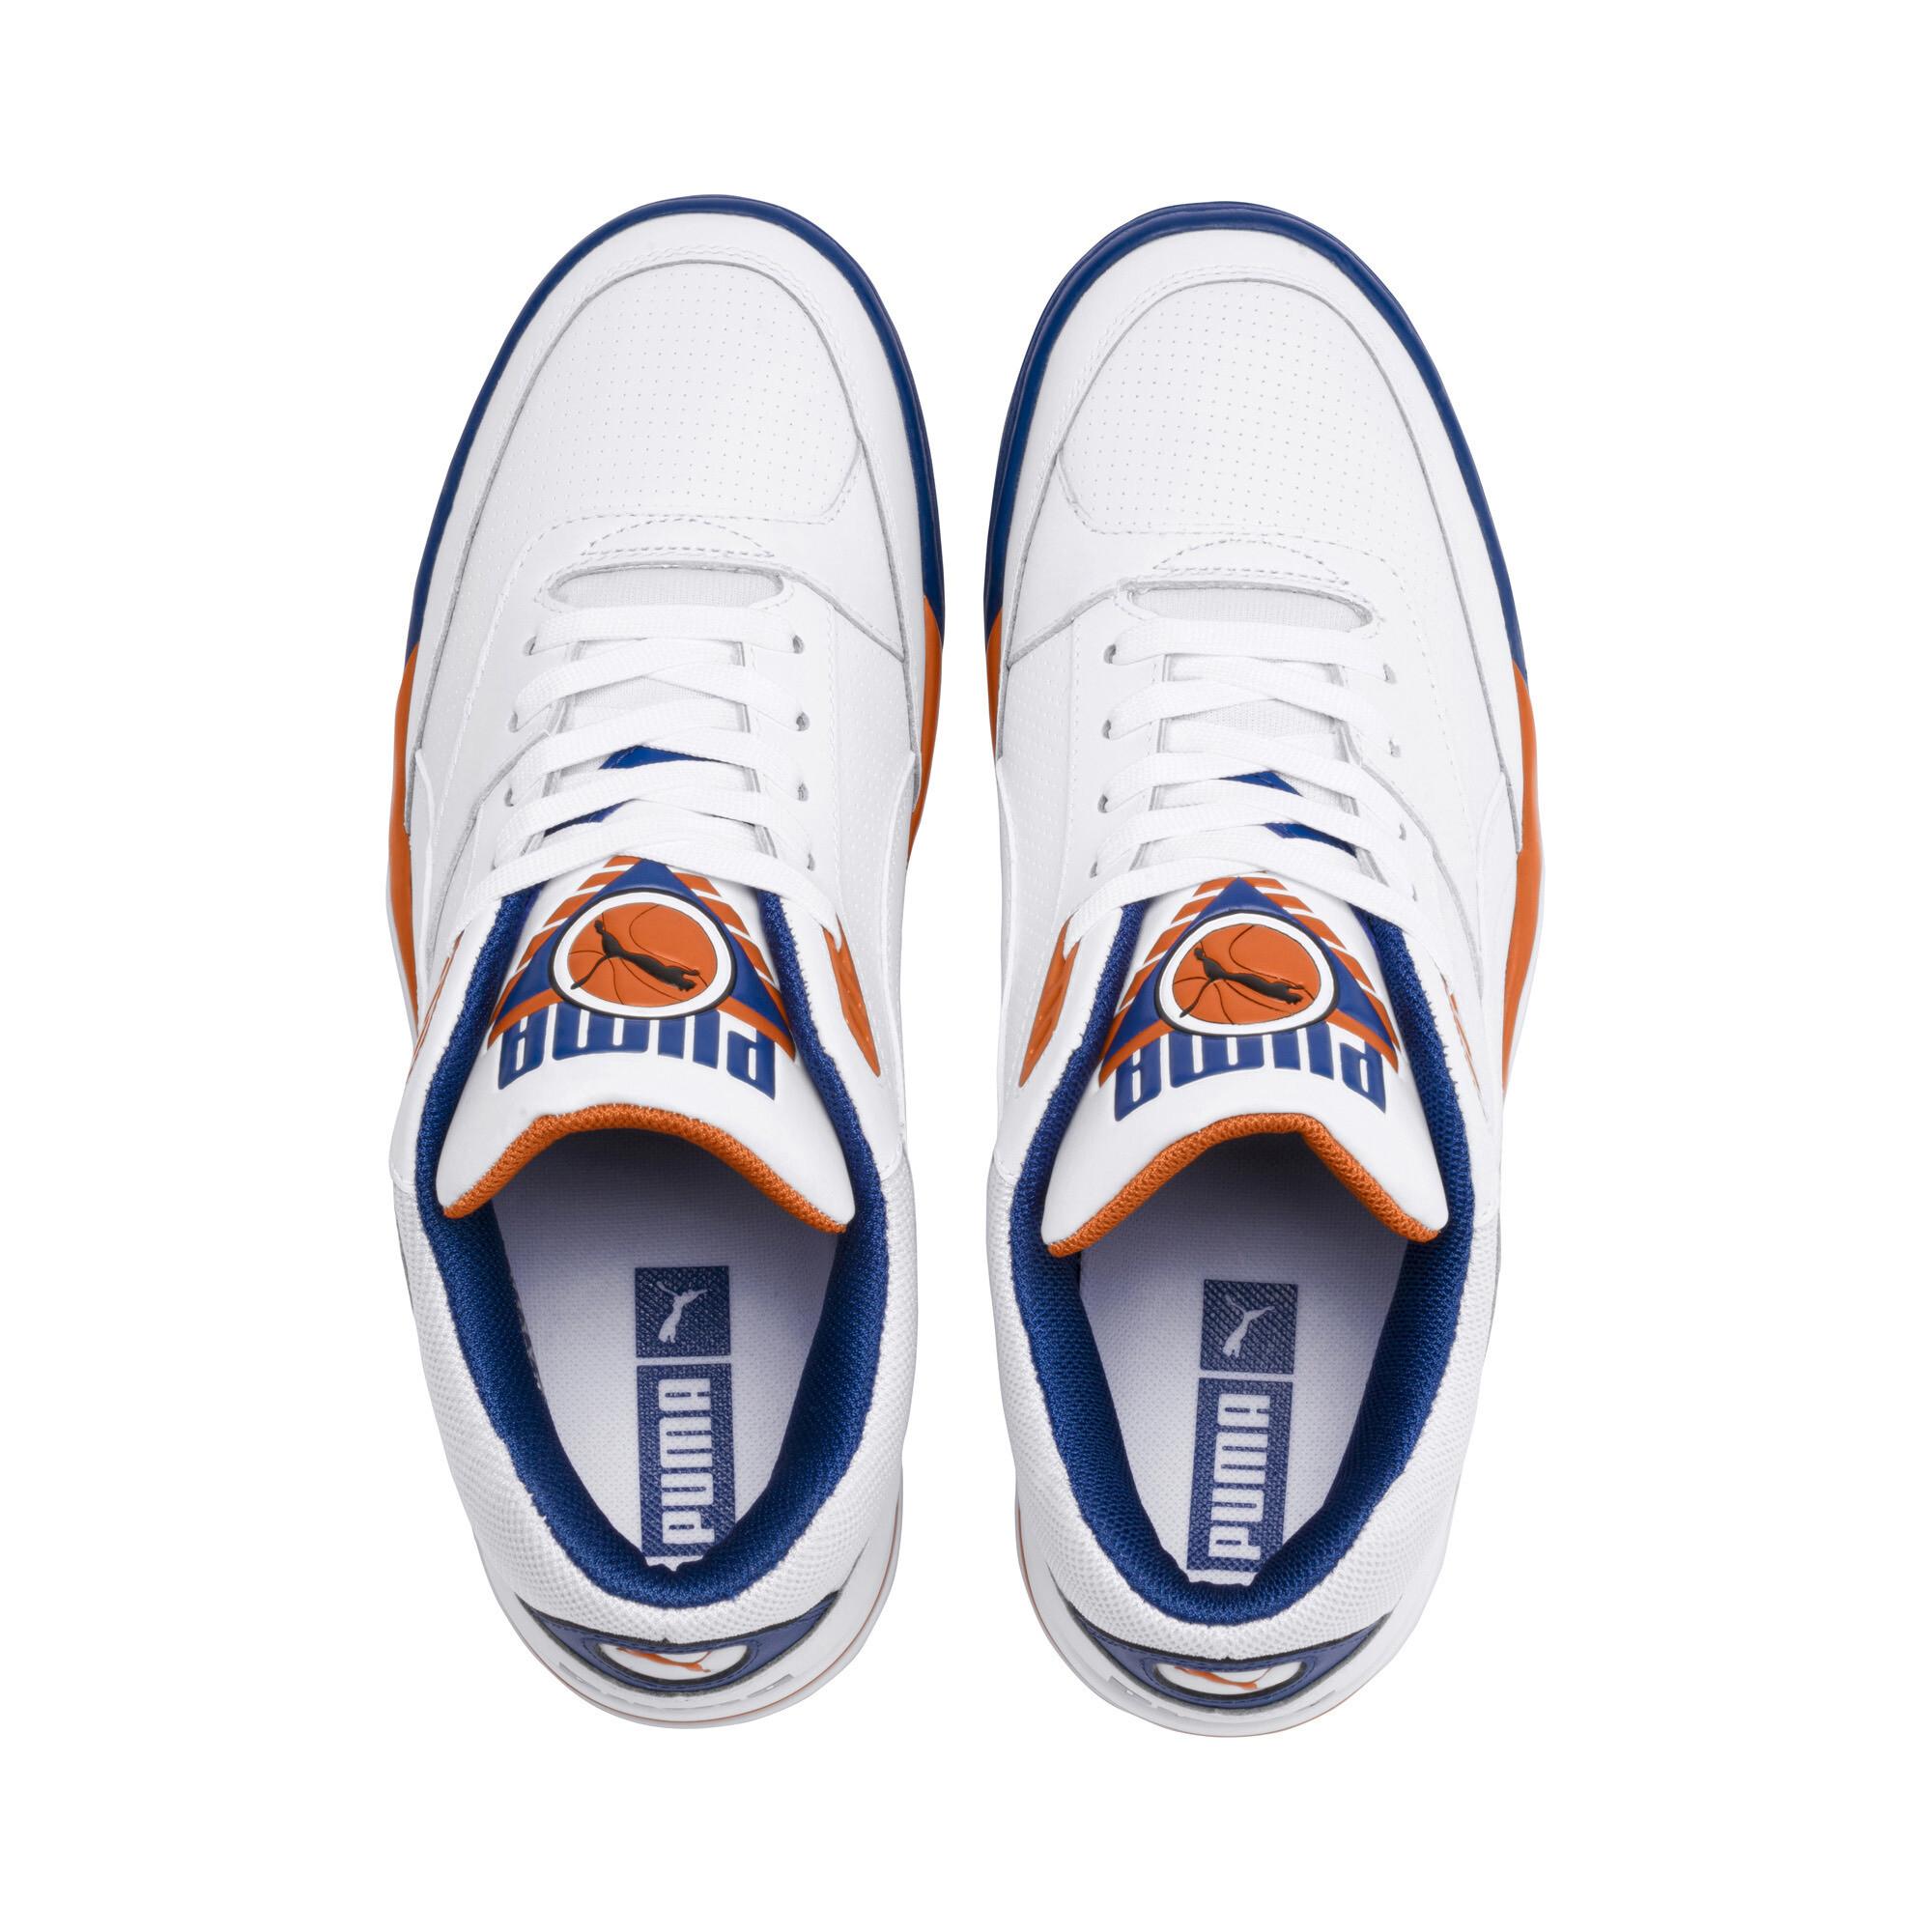 Indexbild 28 - PUMA Palace Guard Sneaker Unisex Schuhe Sport Classics Neu